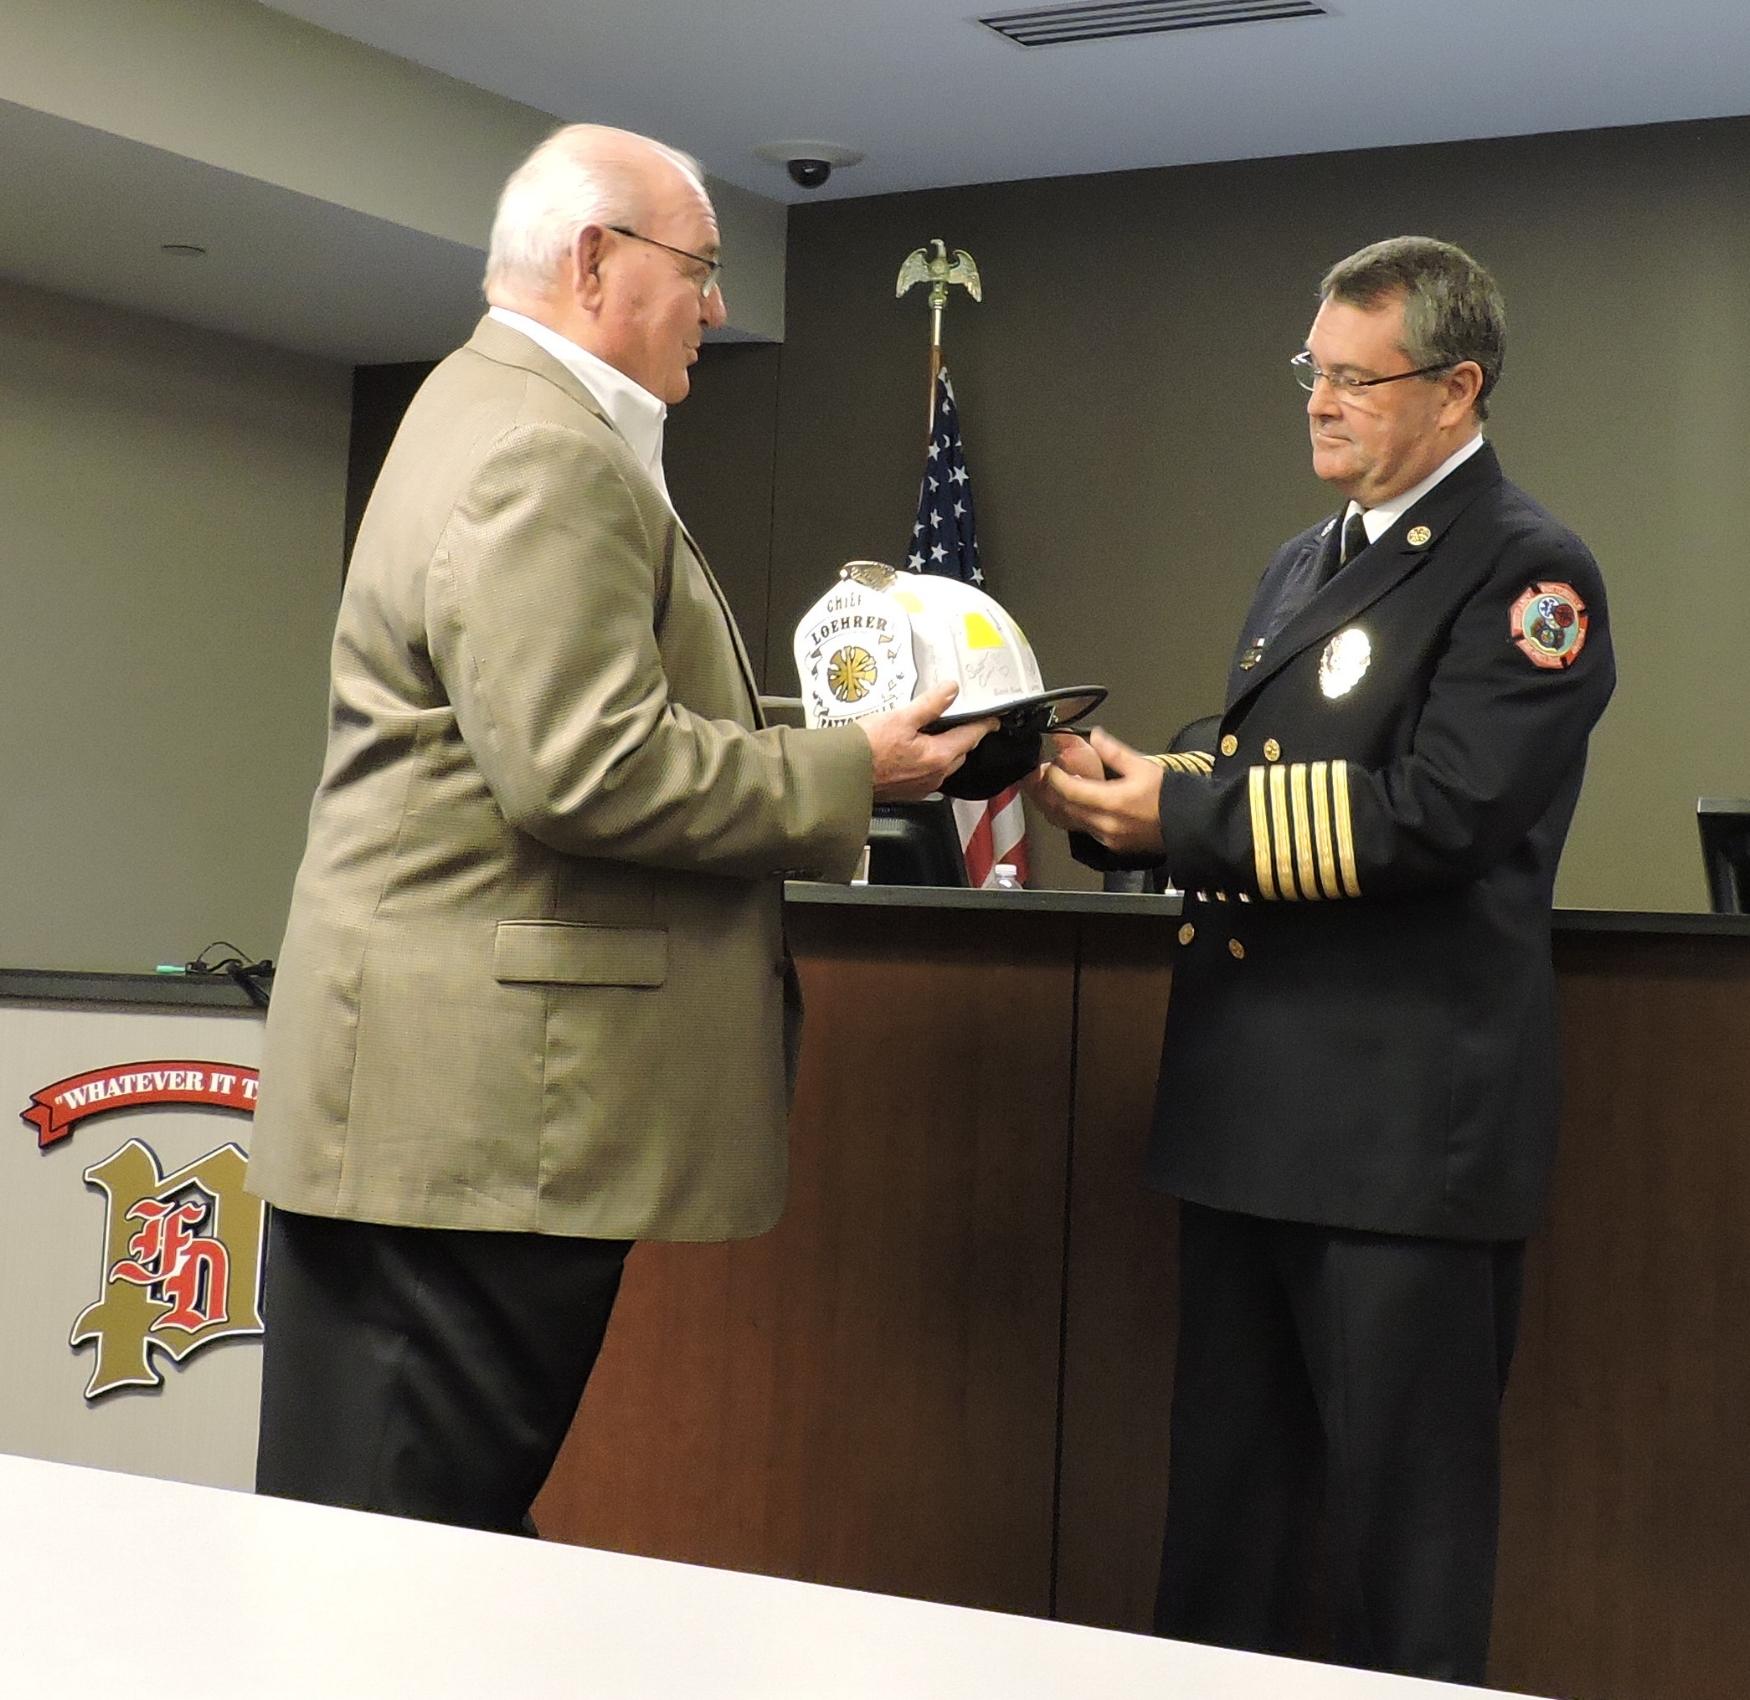 Left to Right: Board Chairman Bill Esterline, Retiring Fire Chief Terry Loehrer.